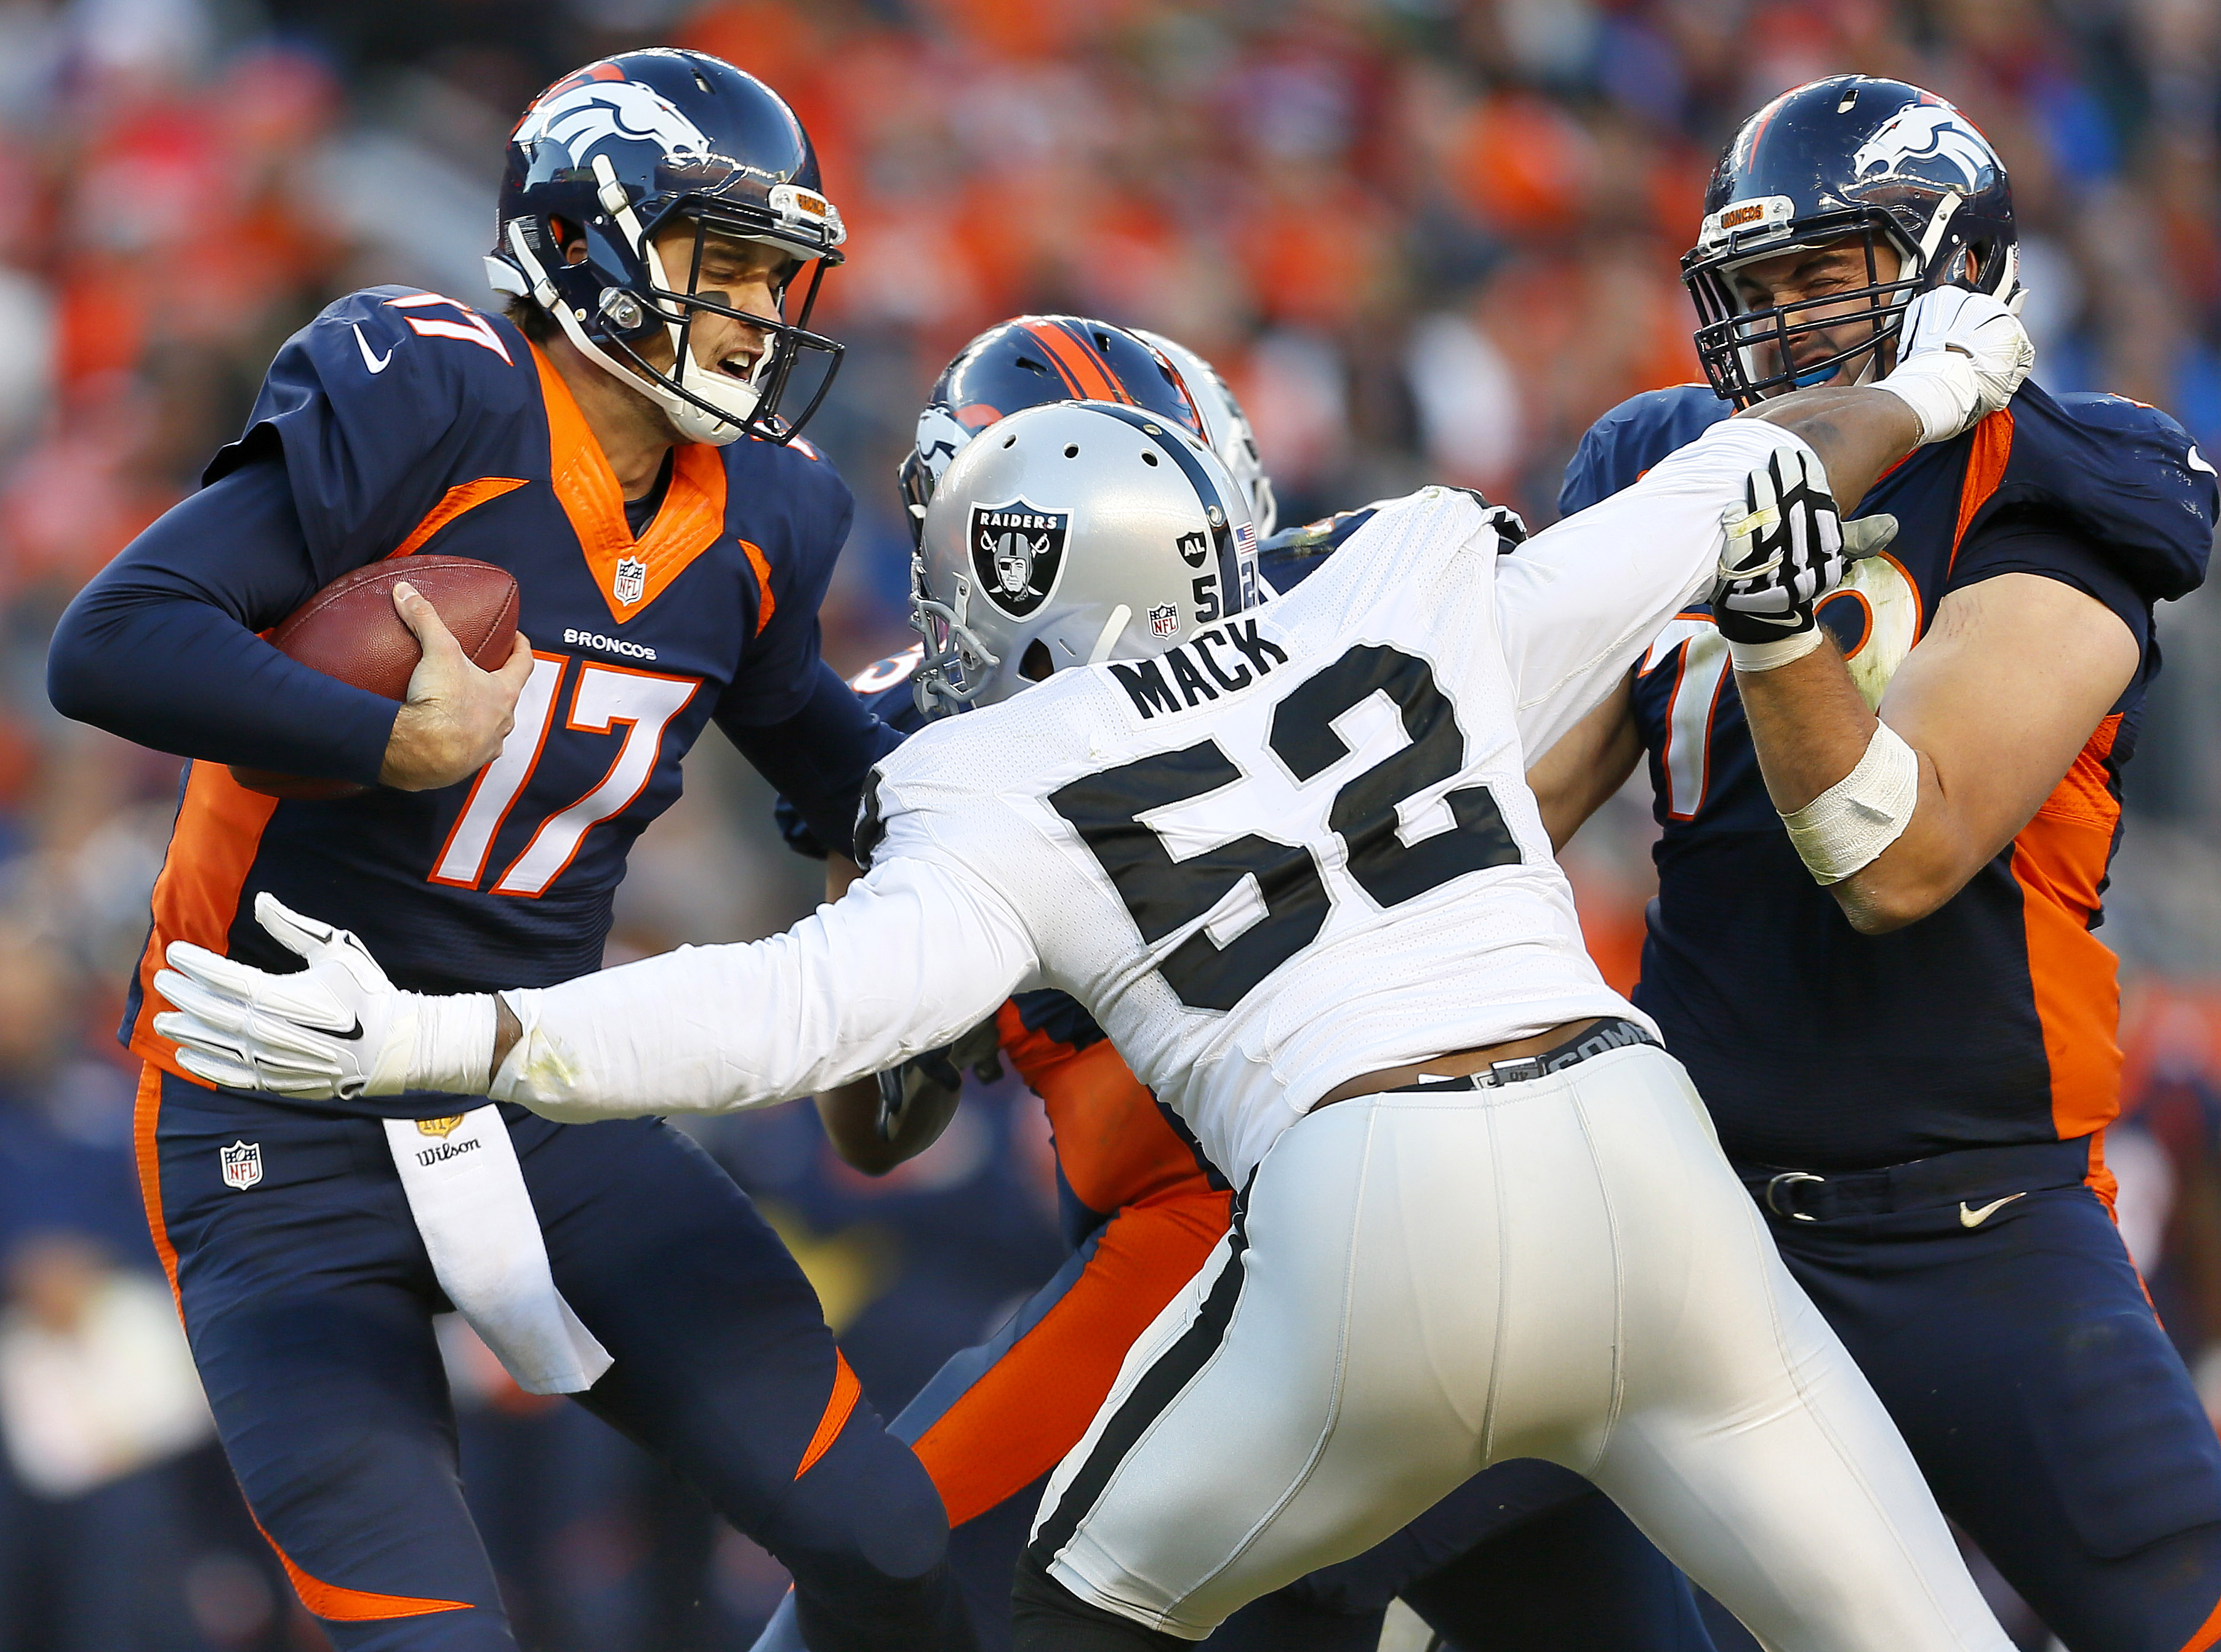 Denver Broncos quarterback Brock Osweiler (17) is sacked by Oakland Raiders defensive end Khalil Mack (52) during the second half of an NFL football game, Sunday, Dec. 13, 2015, in Denver. (AP Photo/Joe Mahoney)